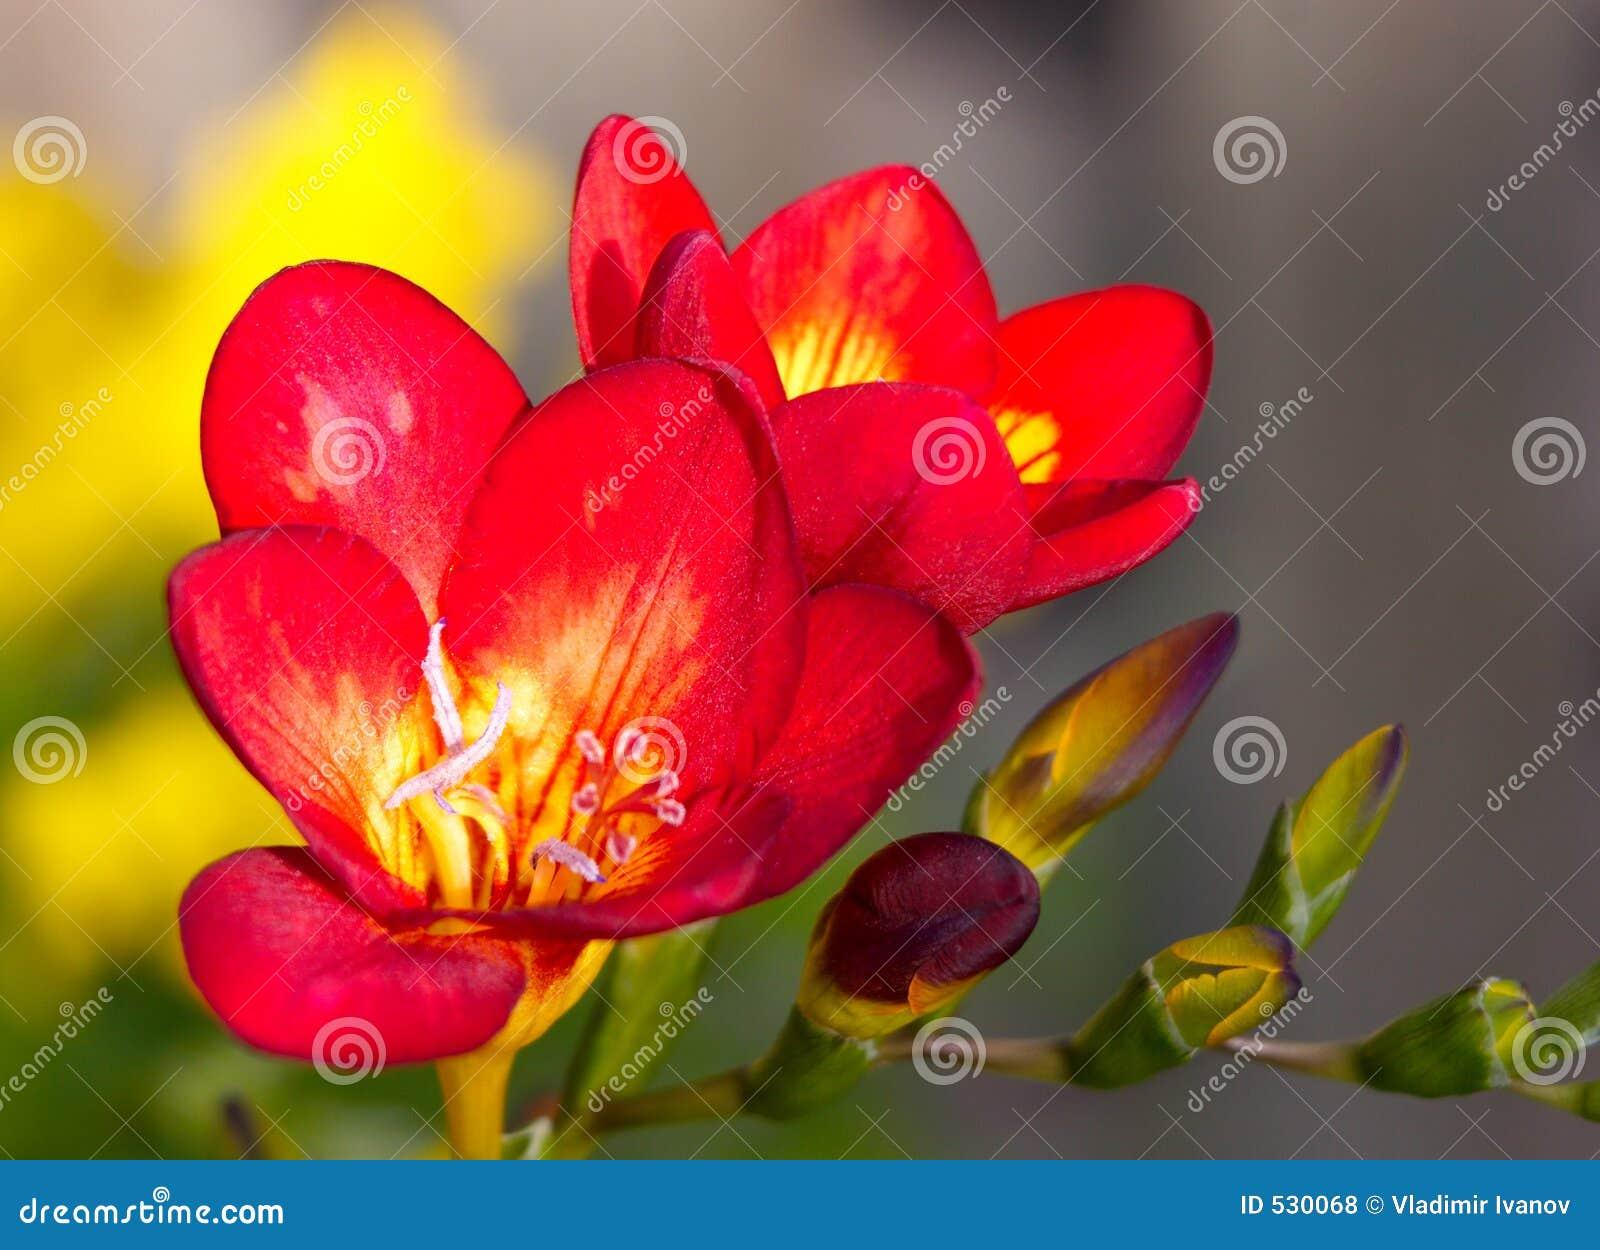 Download 开花红色 库存照片. 图片 包括有 工厂, 室内, 看板卡, 花卉, 红色, 完美, 冬天, 开花的, 明信片 - 530068